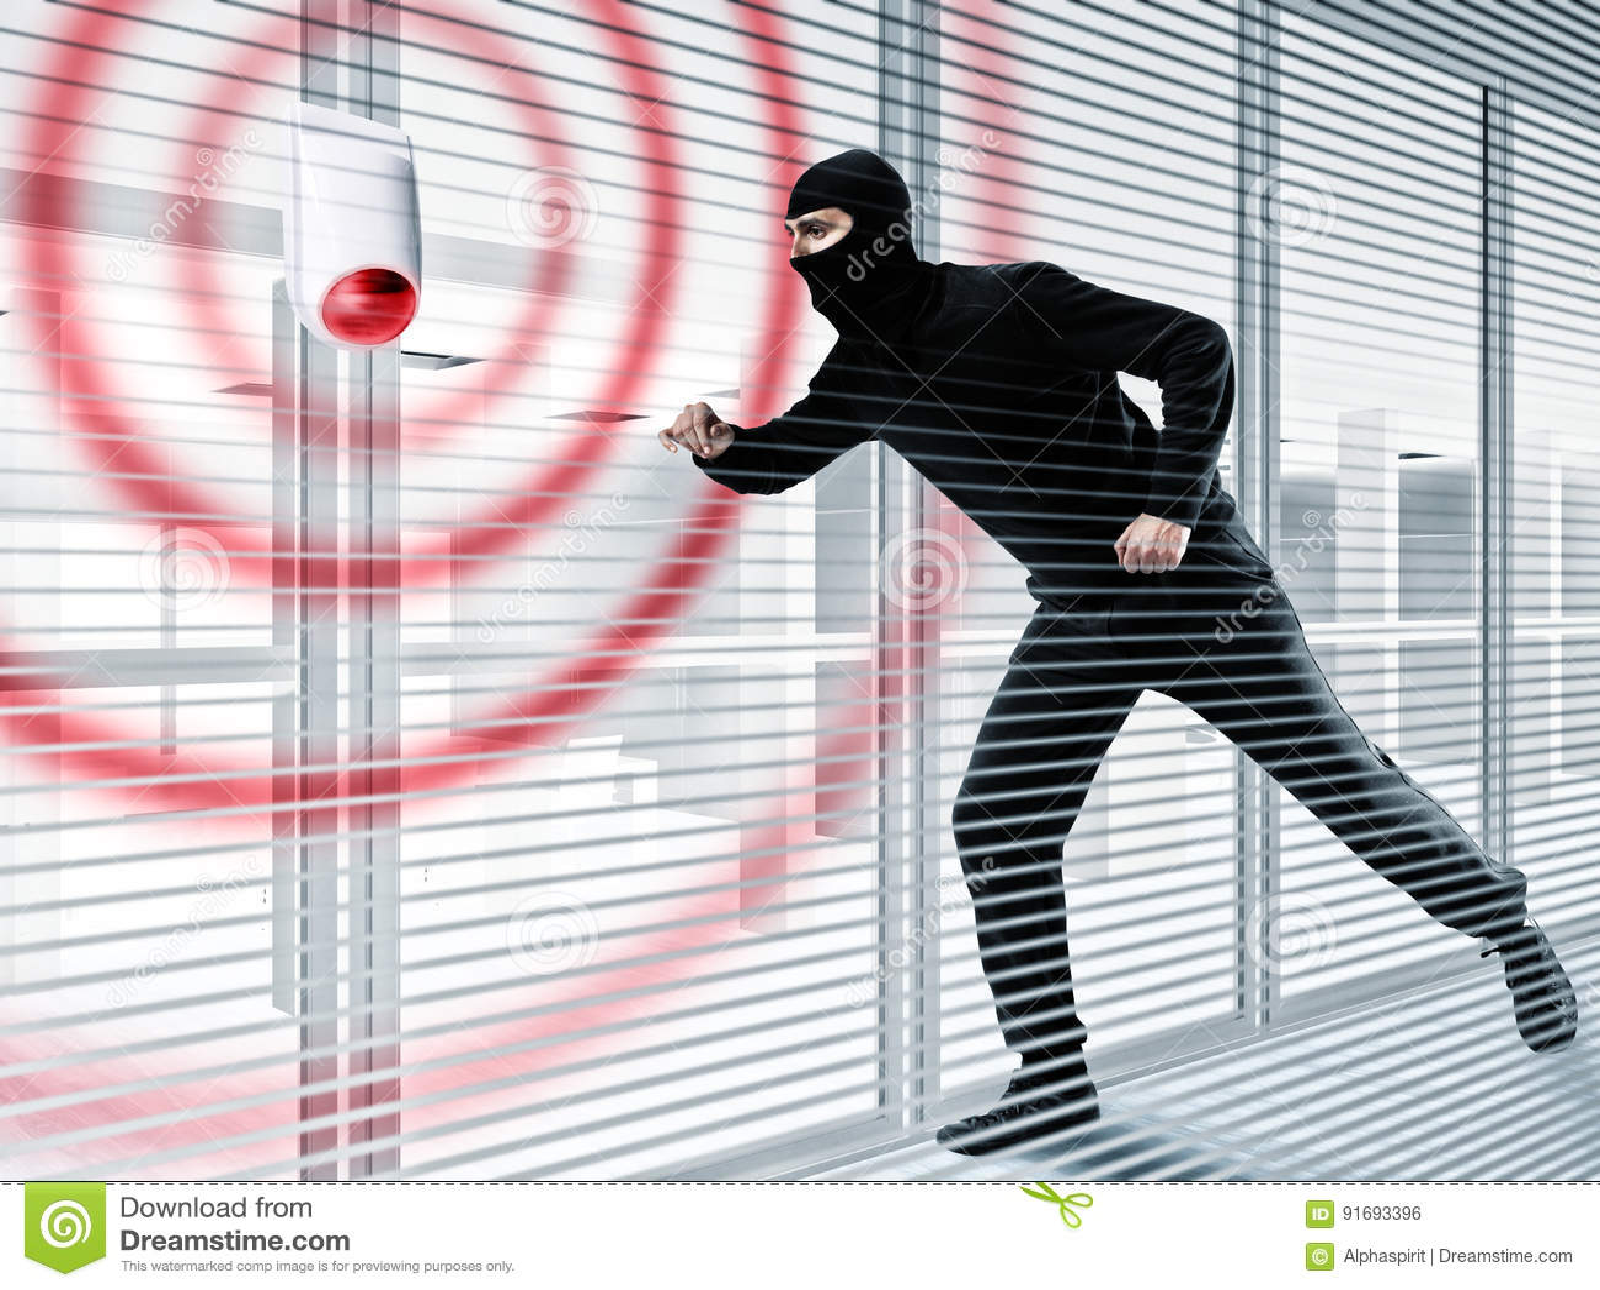 Alarma para robar a un ladrón